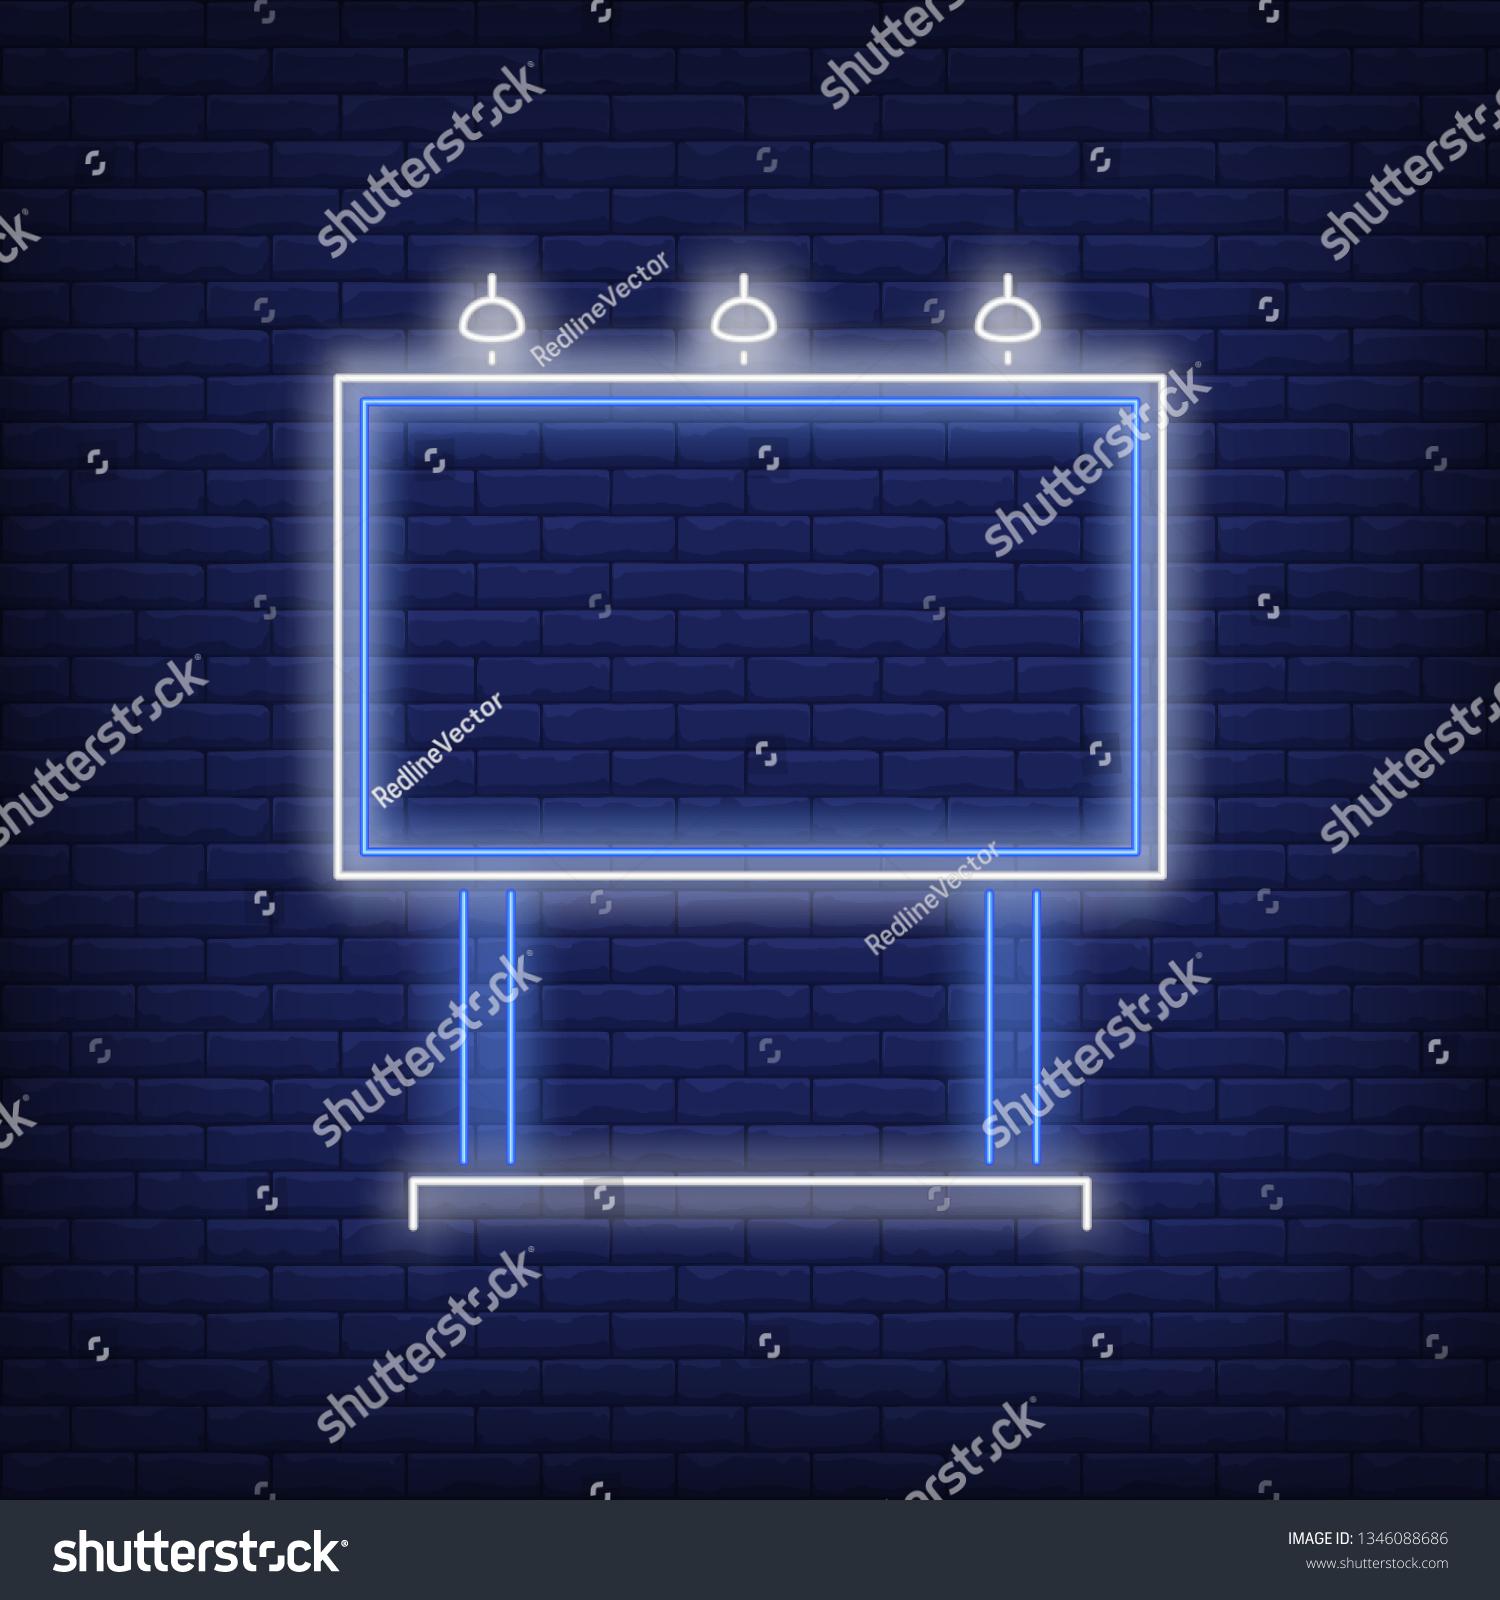 hight resolution of blue billboard neon sign glowing neon advertising billboard on brick wall background vector illustration